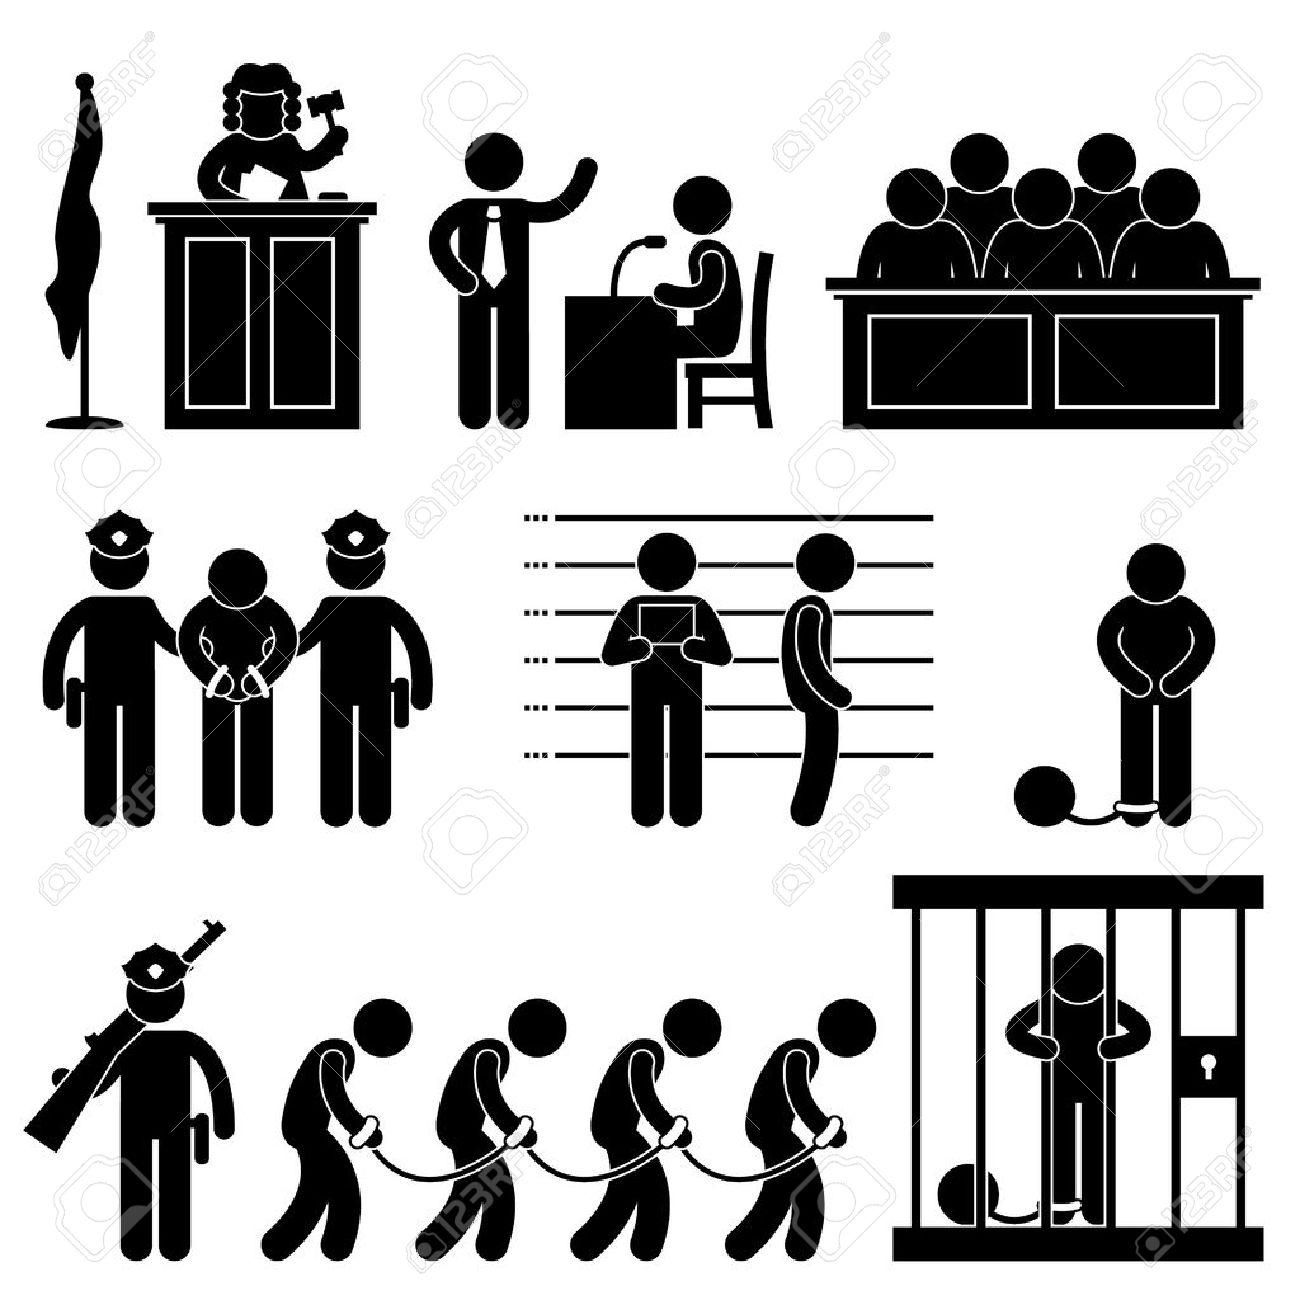 Court Judge Law Jail Prison Lawyer Jury Criminal Icon Symbol Sign Pictogram - 11965742